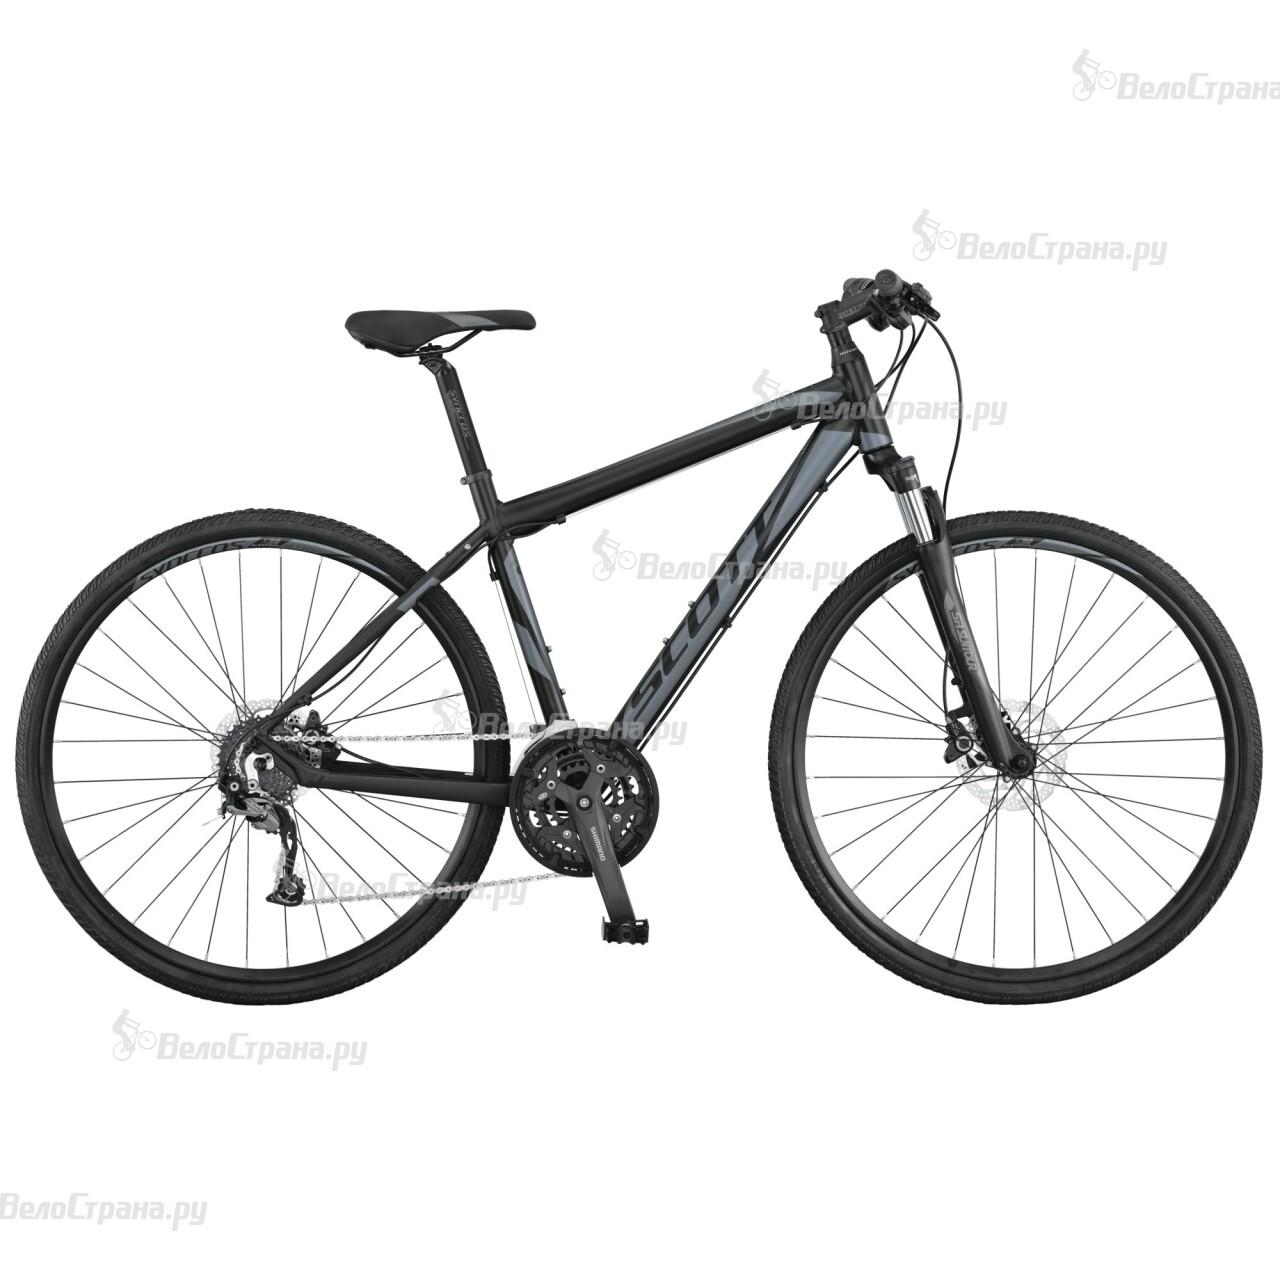 Велосипед Scott Sportster 40 Men (2015) 2015 csm360